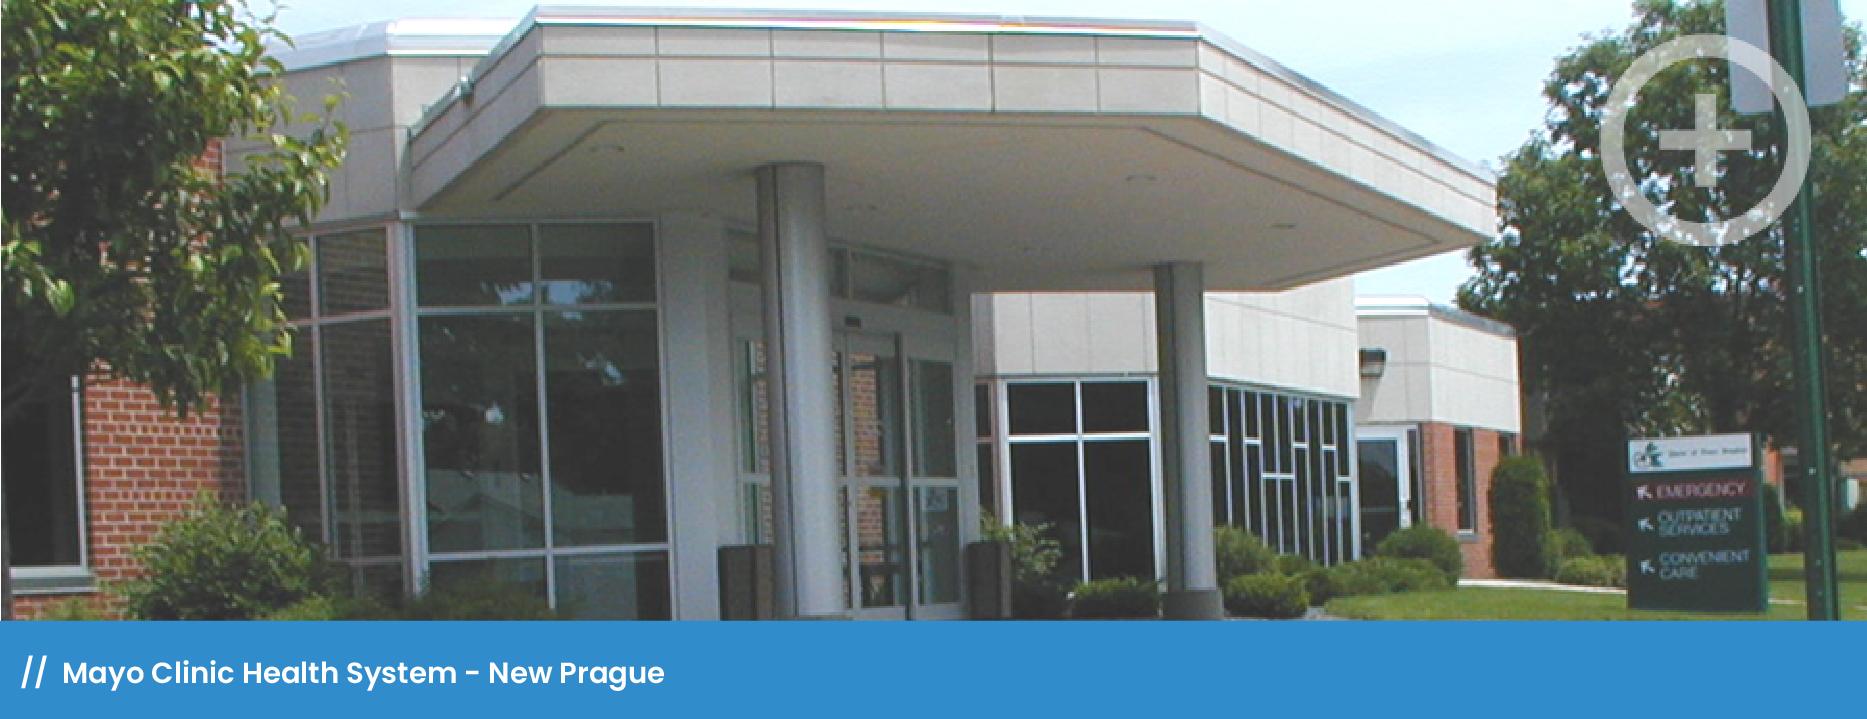 Yanik-Watermark_Mayo Clinic Health System - New Prague